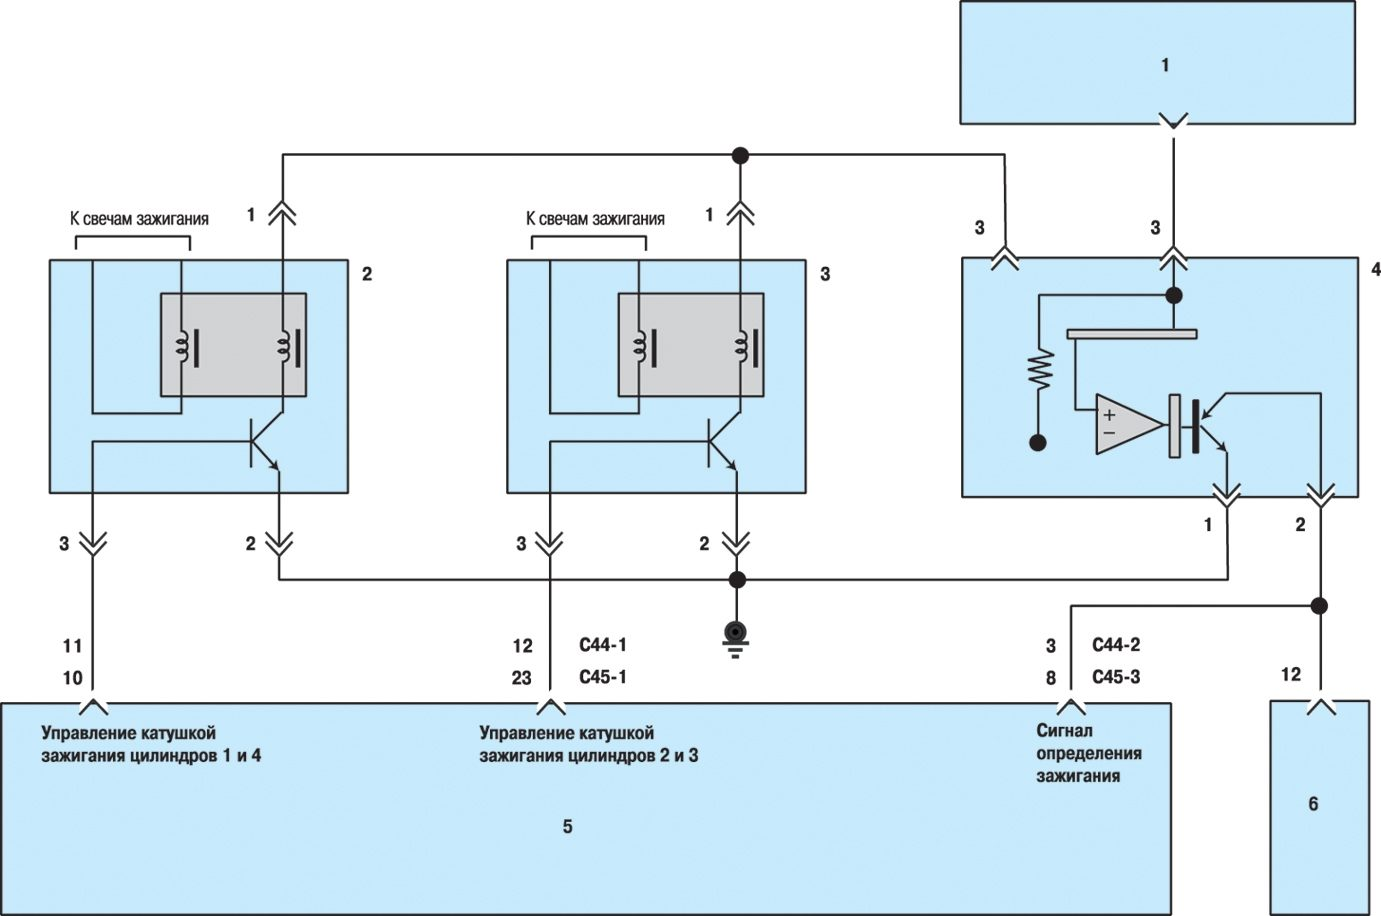 Схема электрооборудования хендай соната фото 834